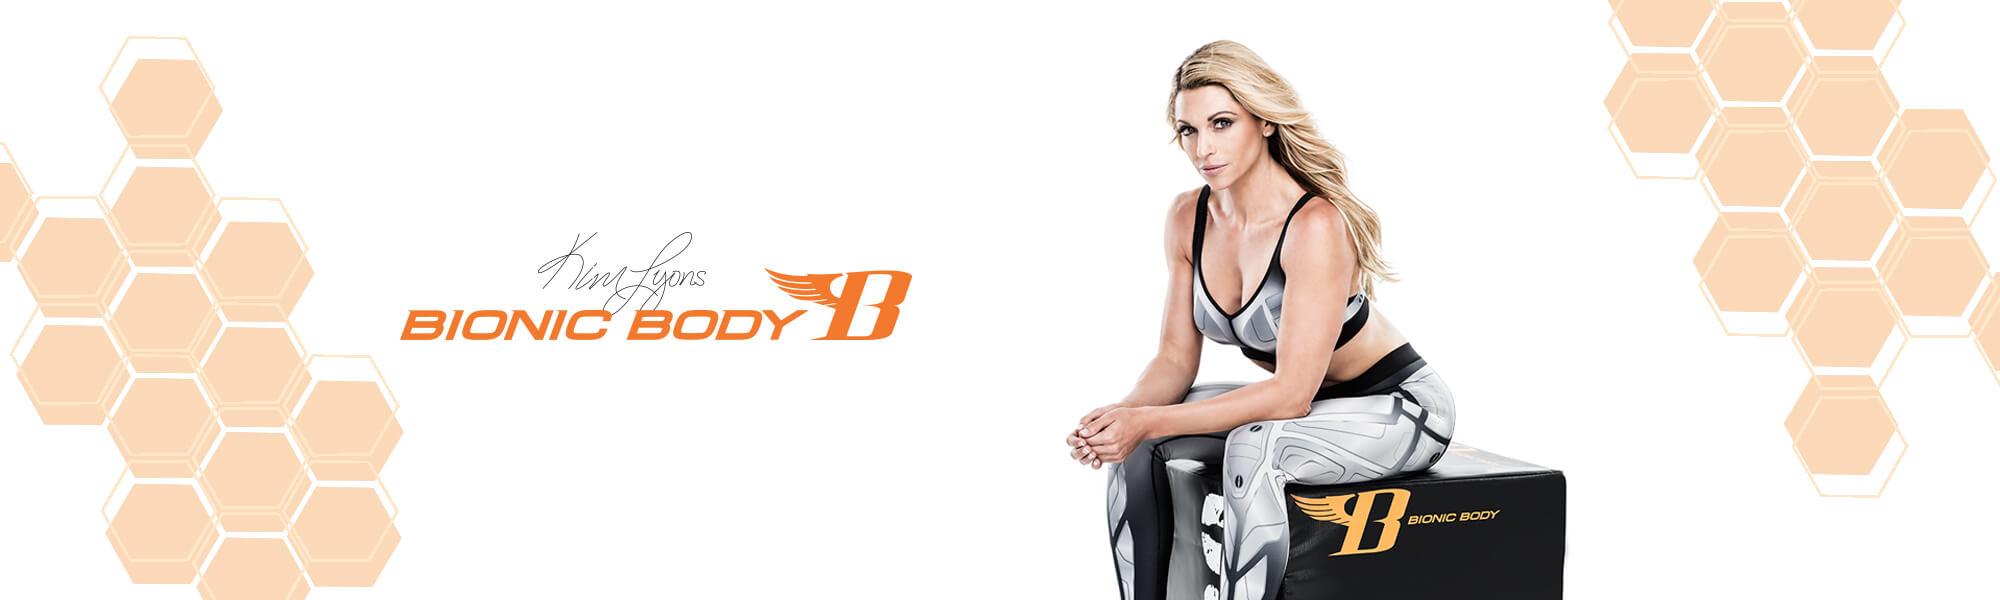 Bionic Body Gear - Kim Lyons with Plyo Box